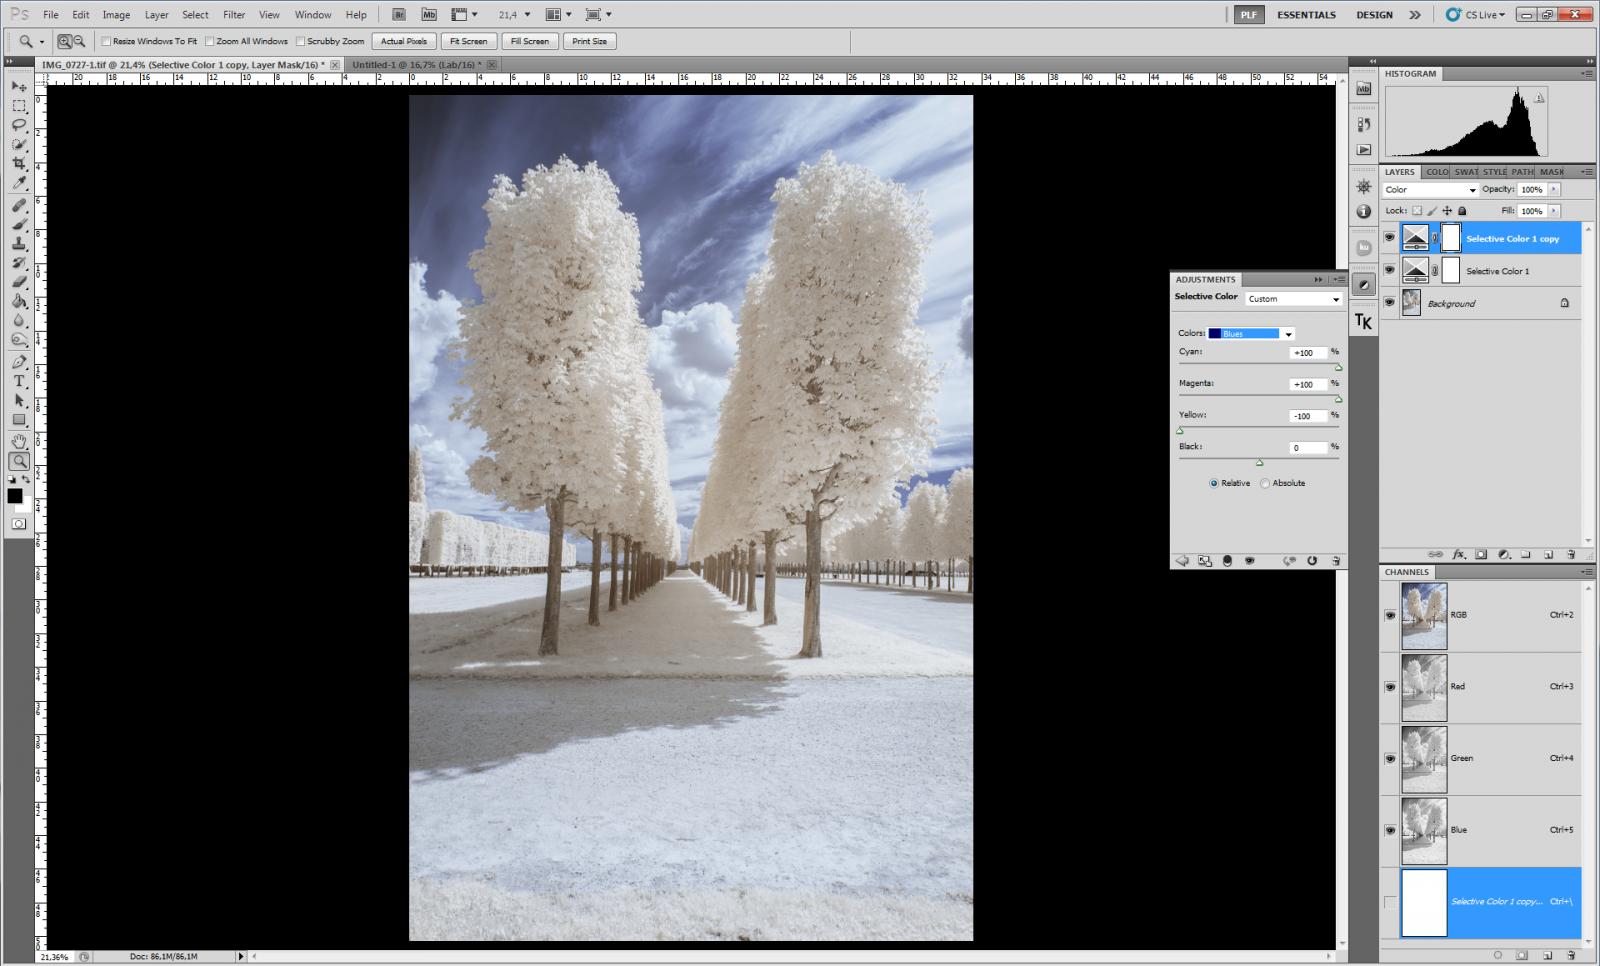 IR tuto 4 | Pierre-Louis Ferrer Photographie | Photographie infrarouge